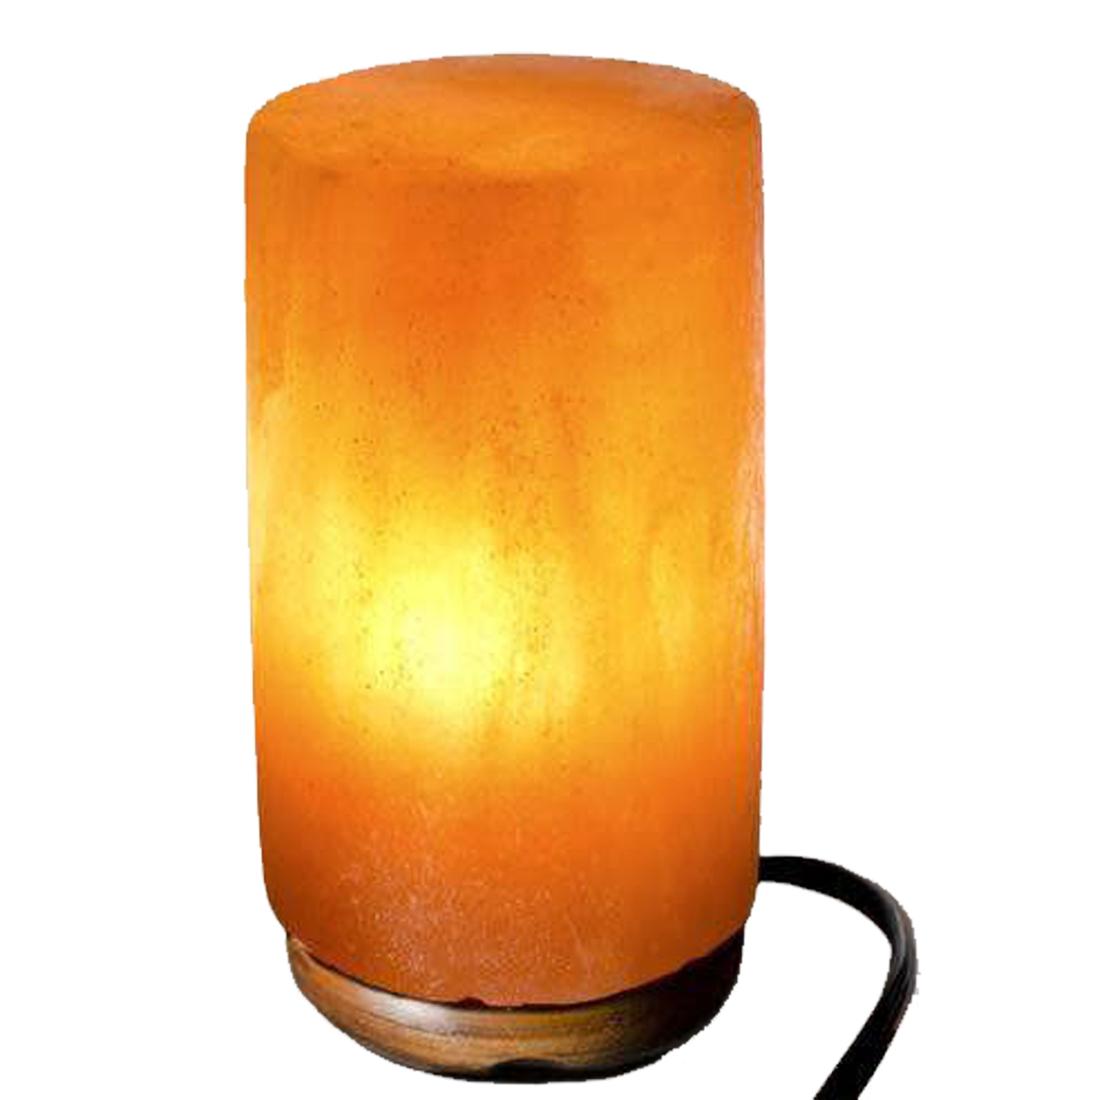 Naturals Vastu Rock Salt Lamp Cylinder Shaped | Natural Air Purifier